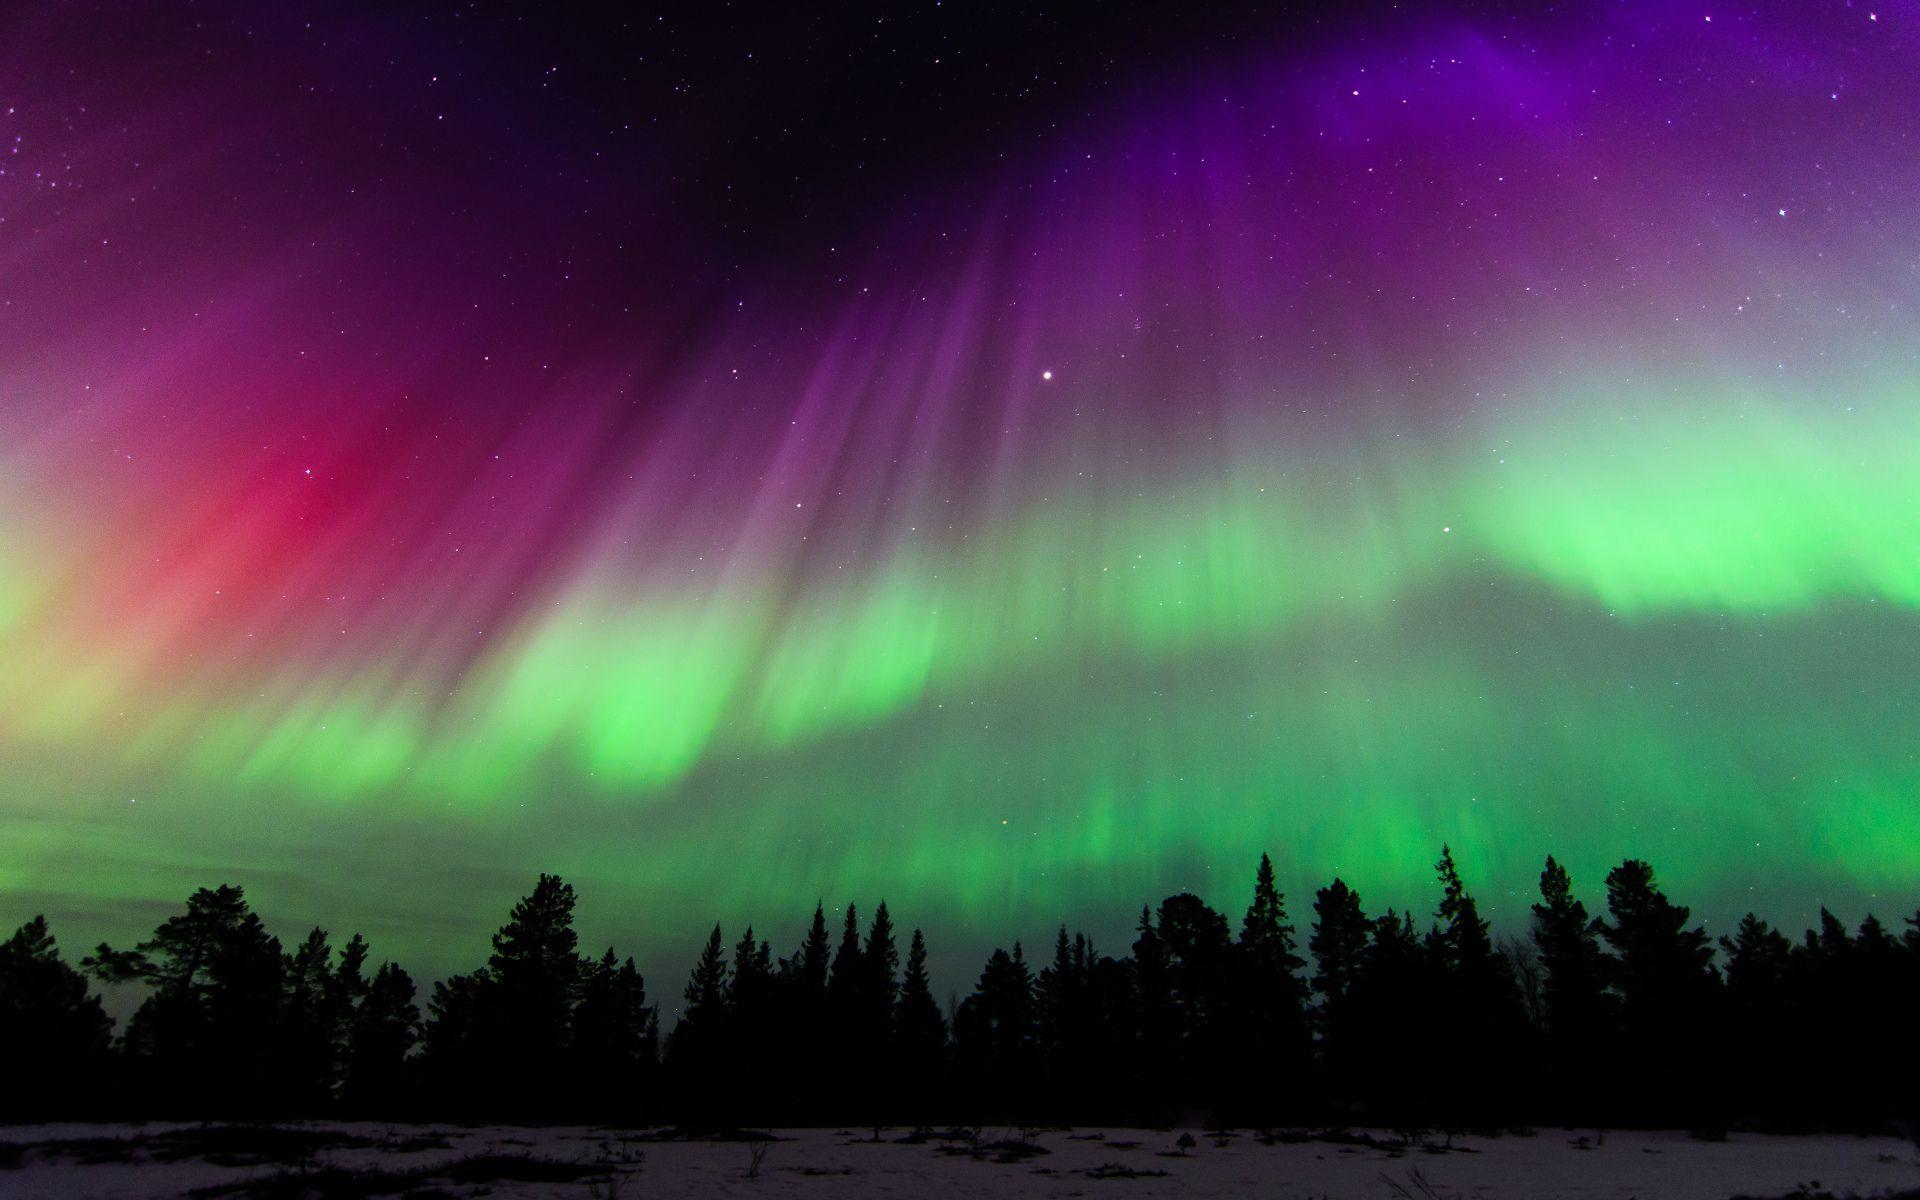 Terra Natureza Aurora Boreal Noruega Sky Stars Papel De Parede